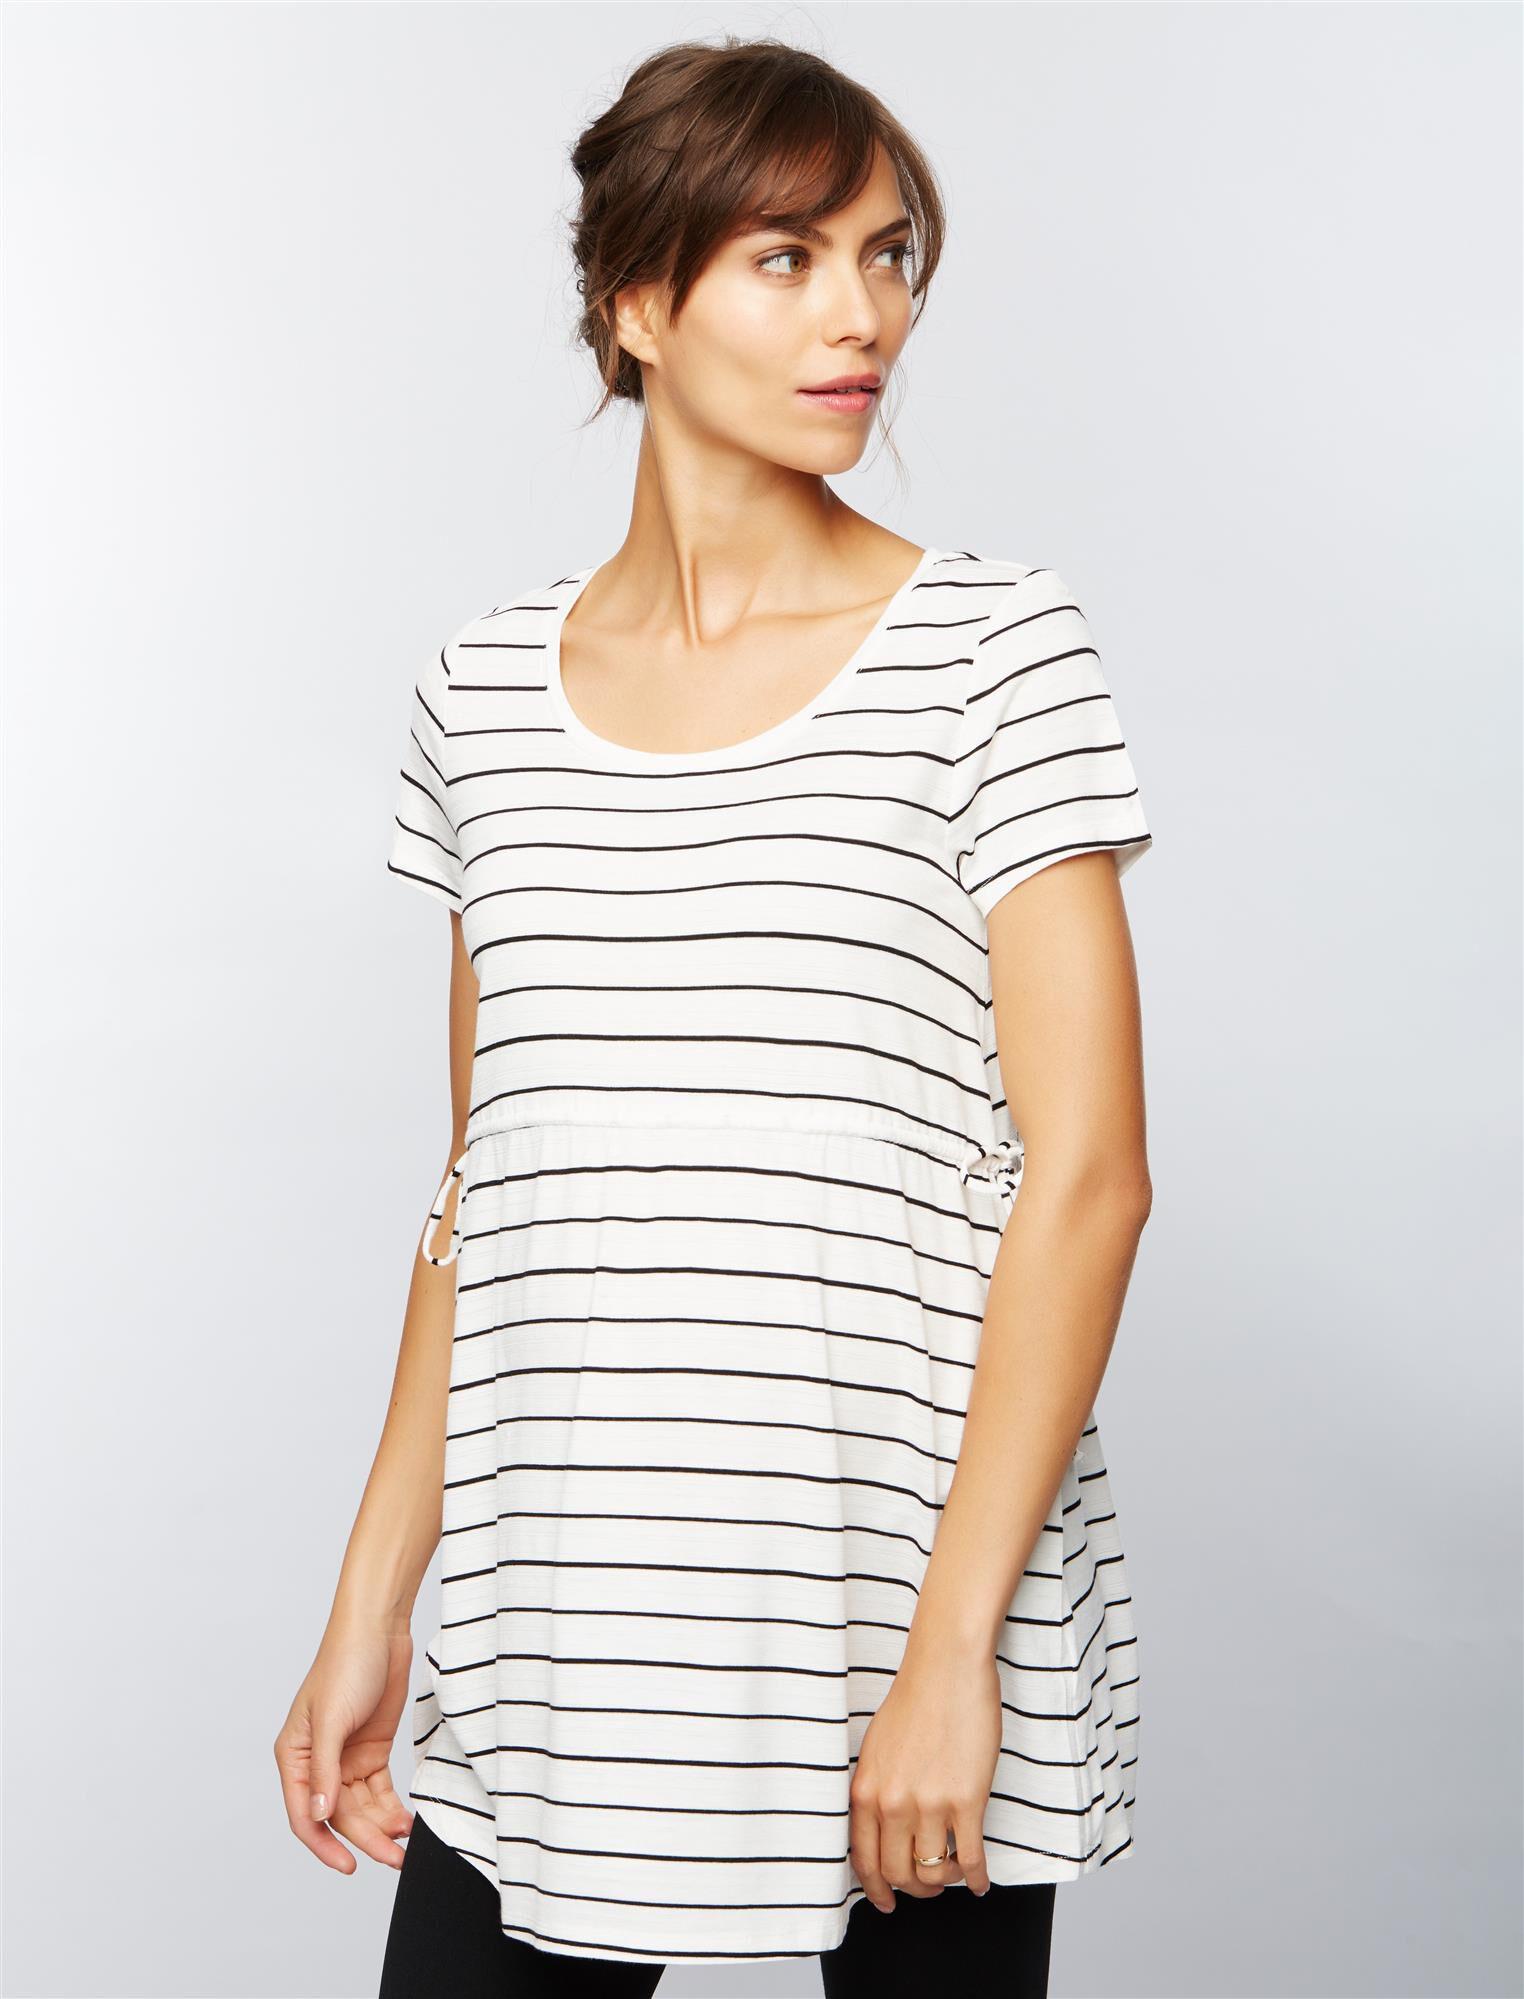 Side Tie Detail Maternity Tunic- Stripe